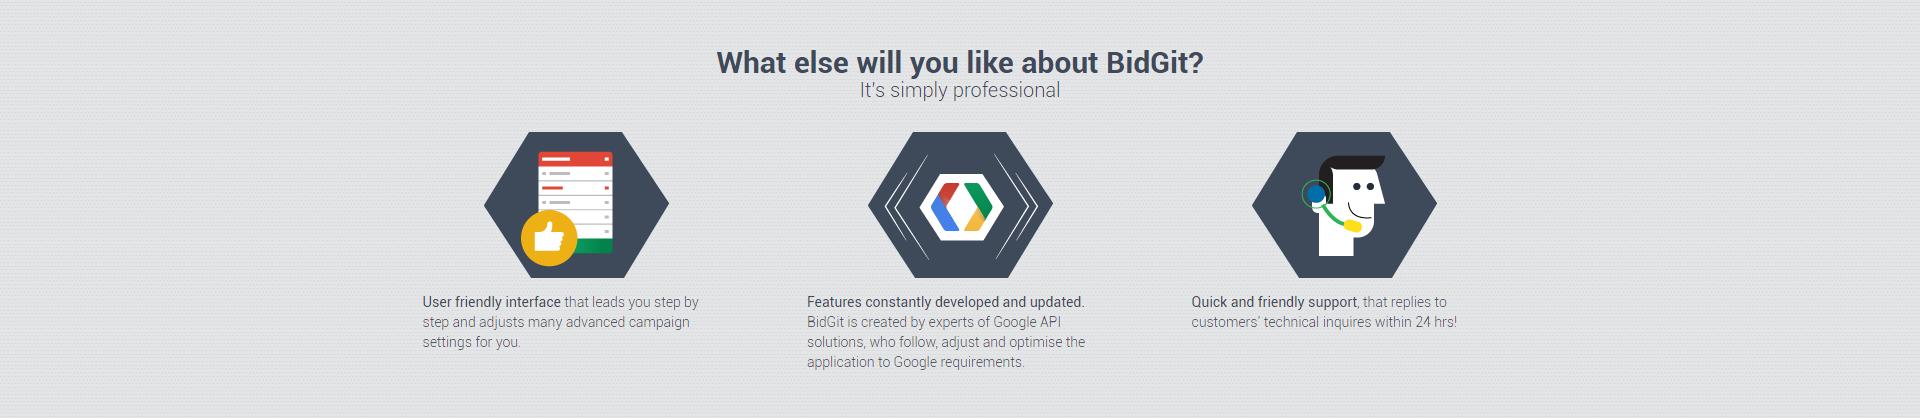 BidGit what else to like